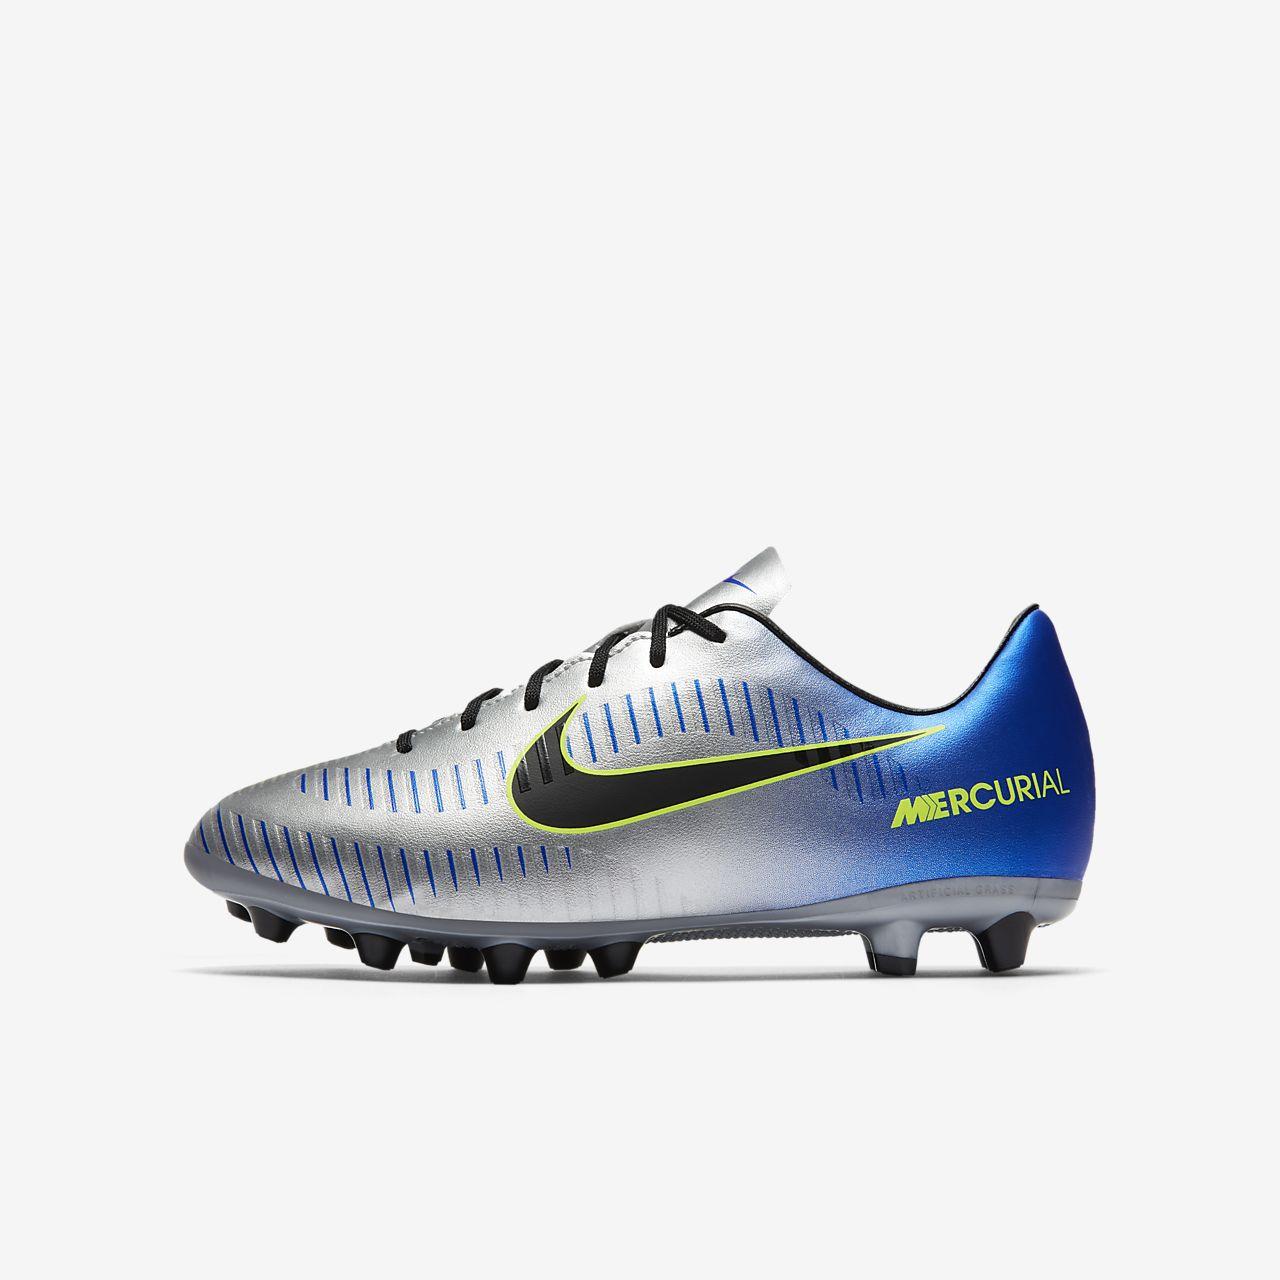 Junior Junior Football Football Football Nike Chaussure Chaussure Junior Nike Chaussure Nike eE2D9IYWH